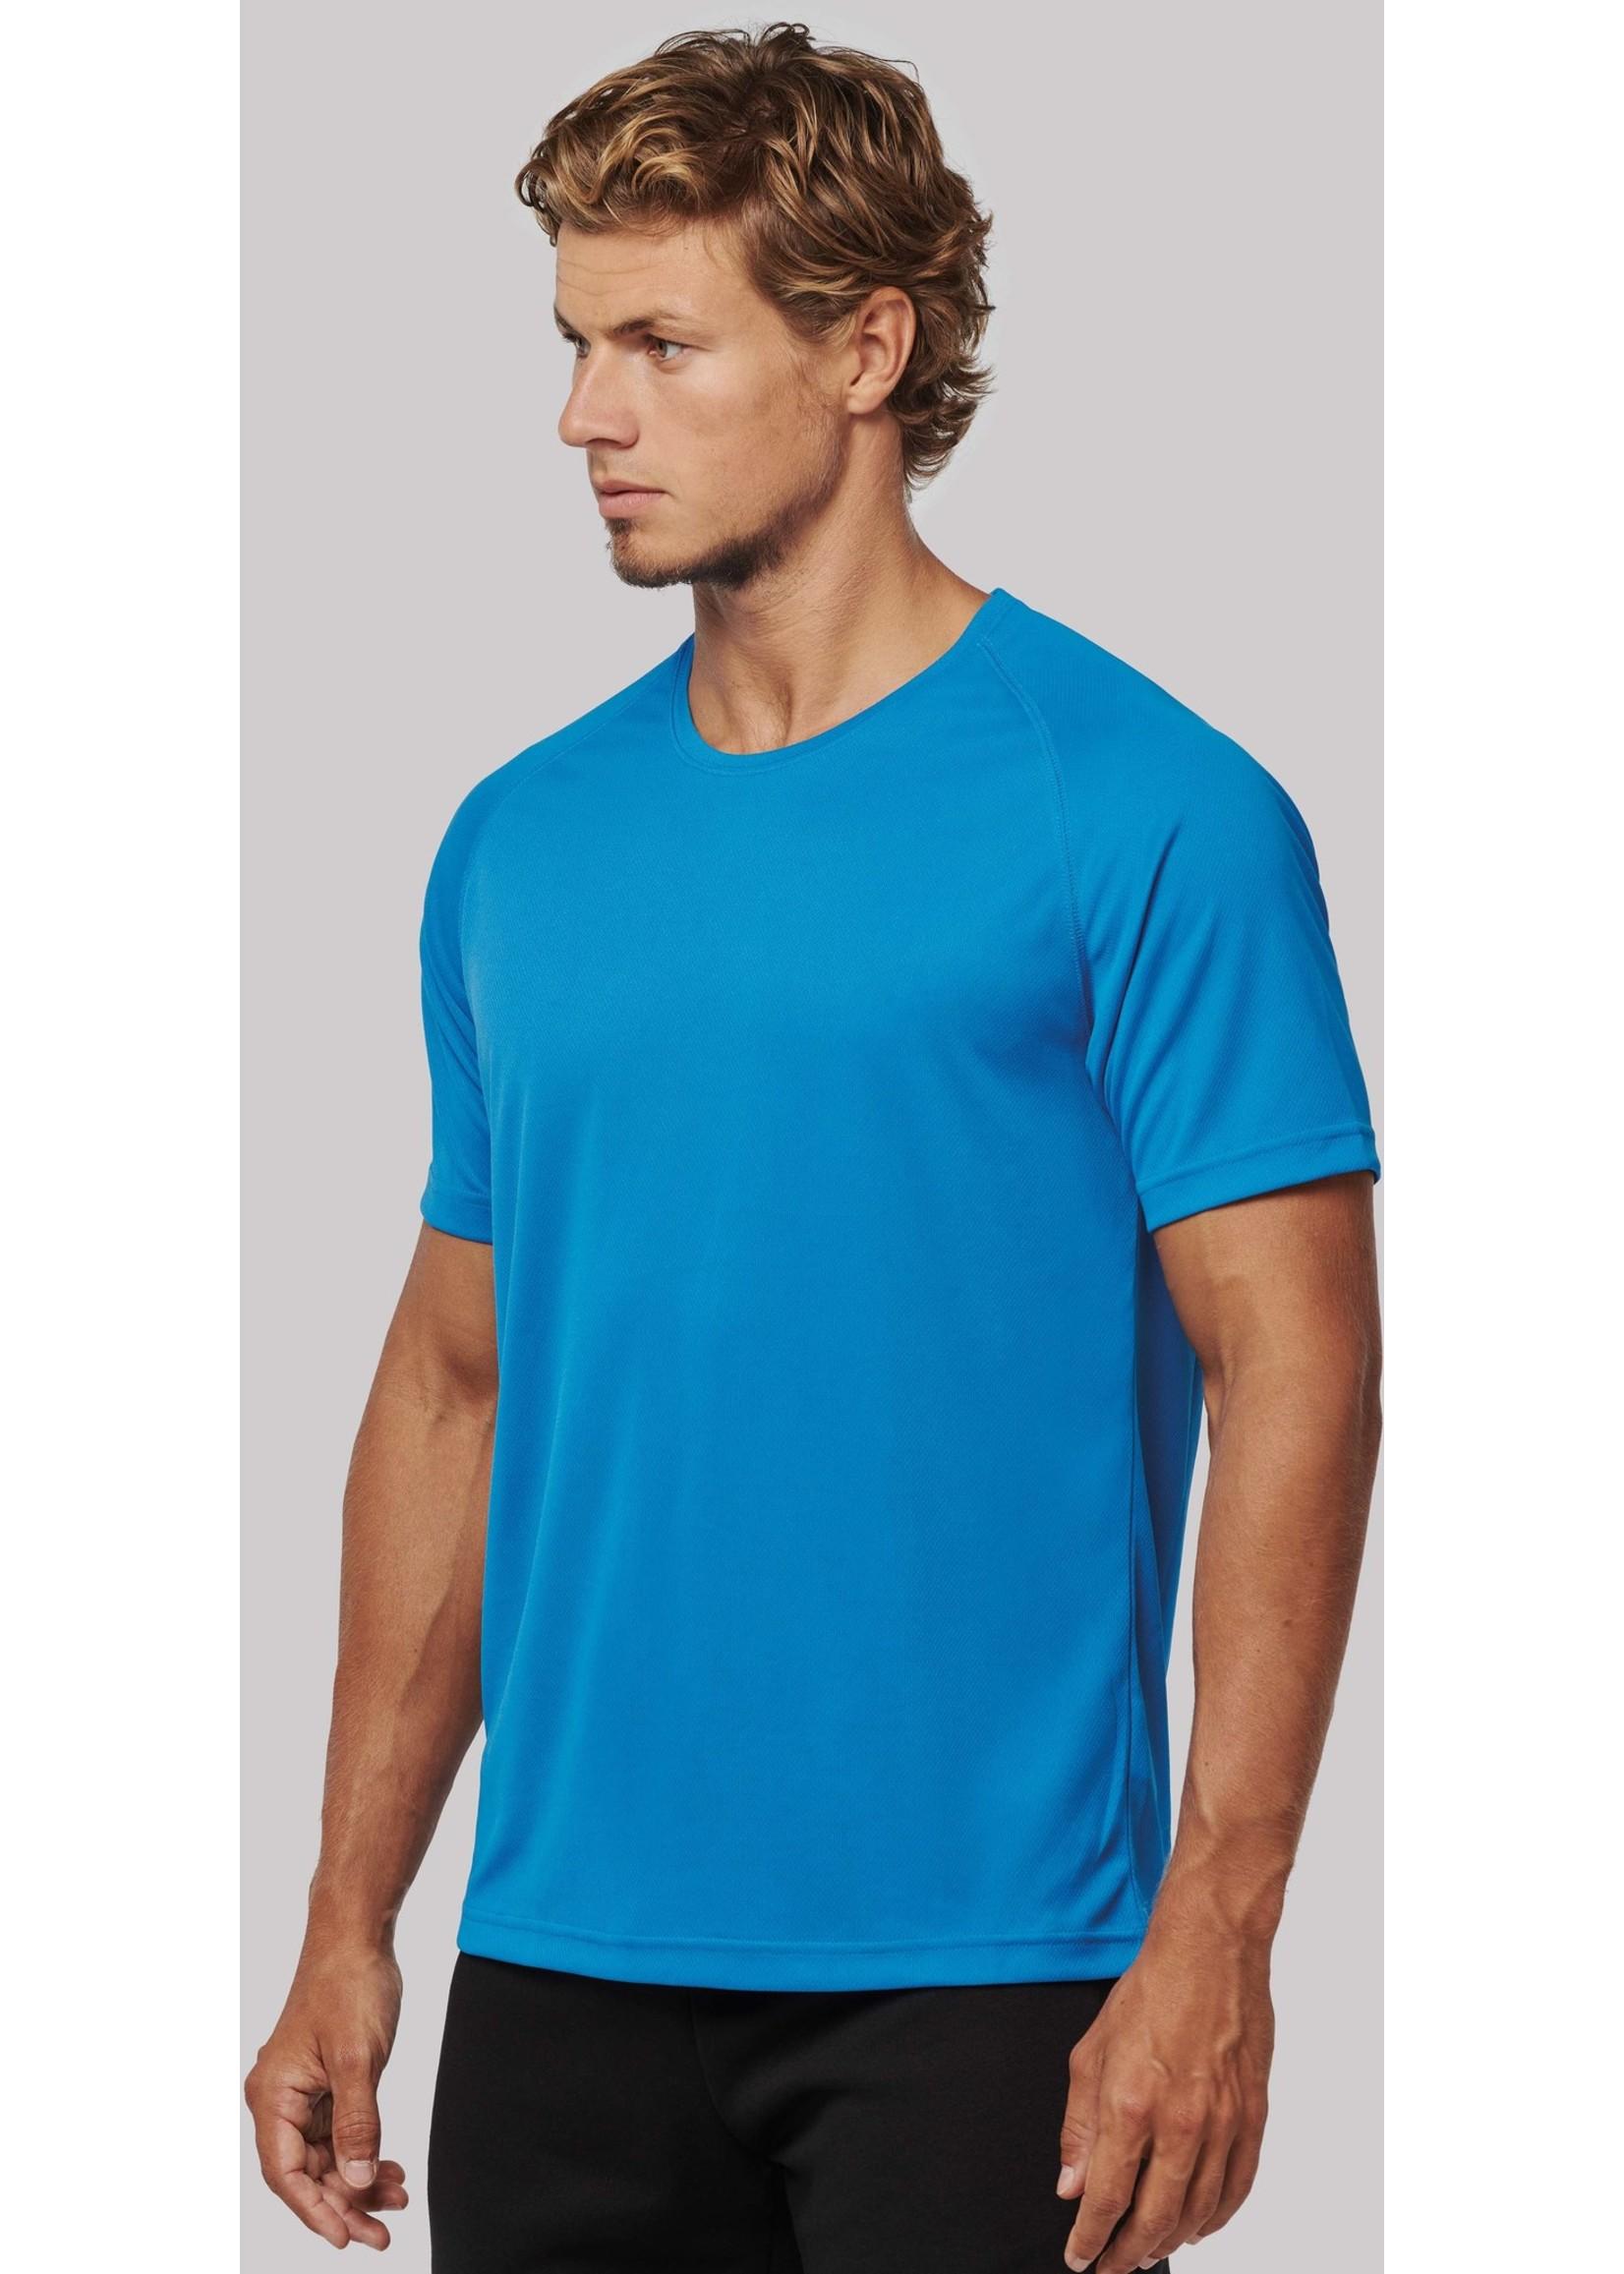 Gerecycled Herensport shirt met ronde hals-aquablue